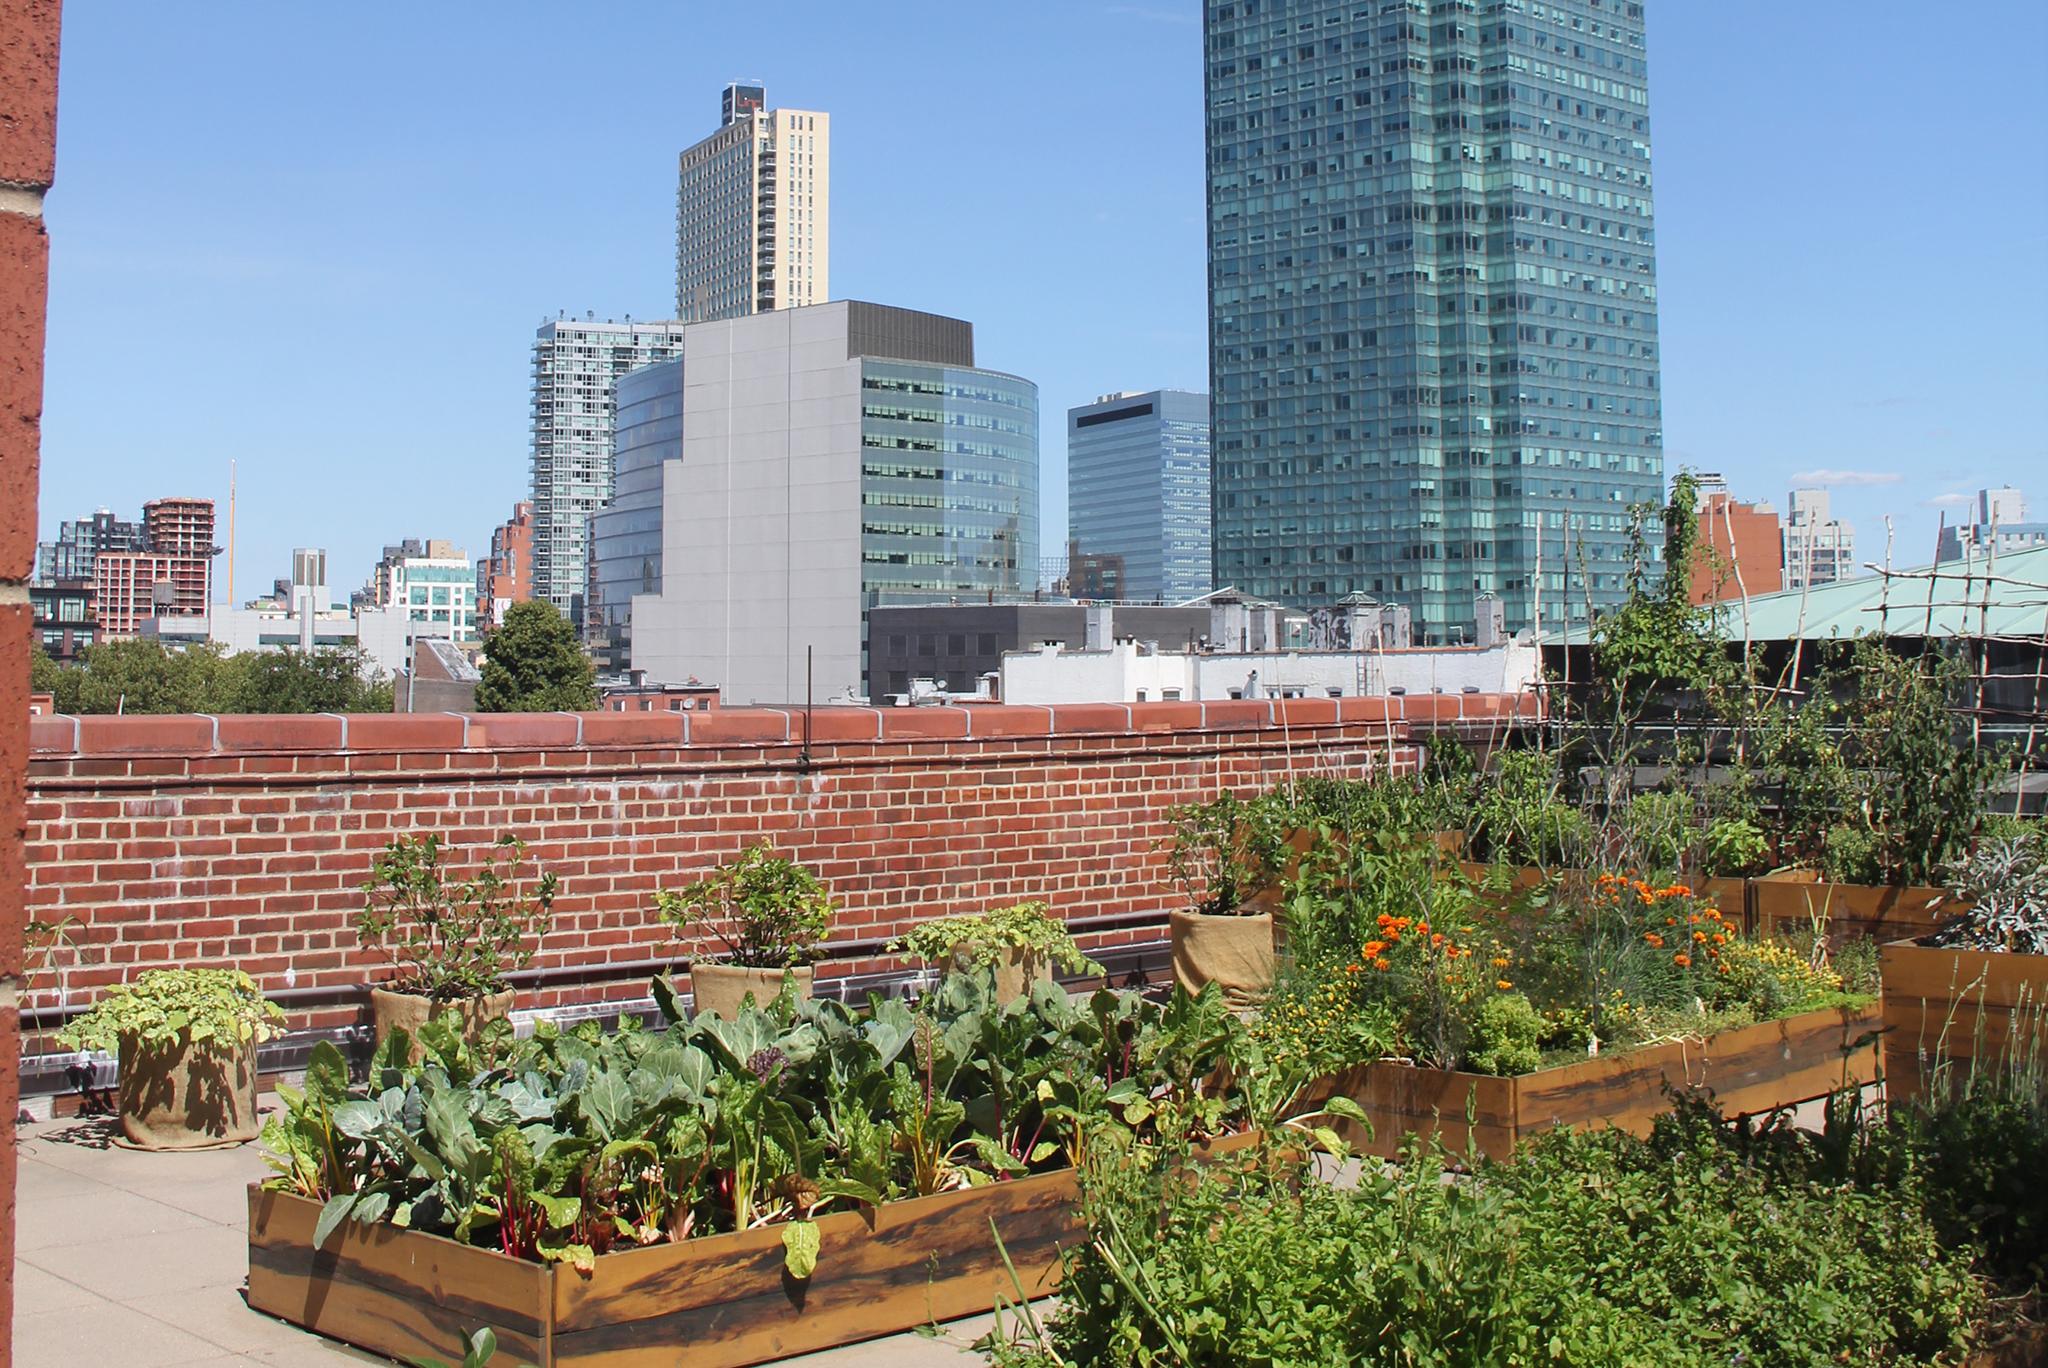 MoMA PS1 rooftop garden